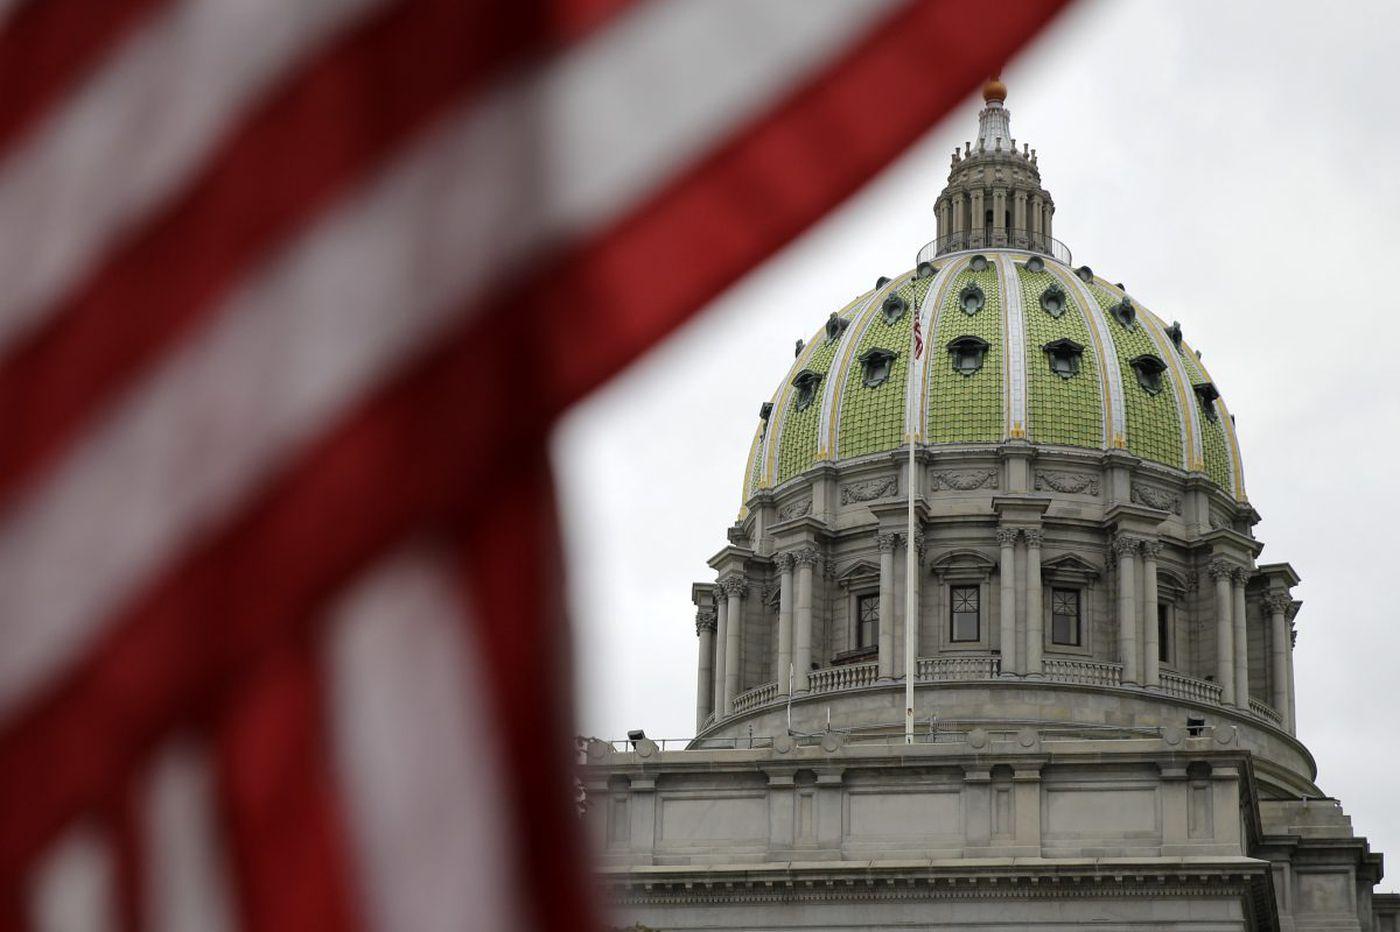 Tax grab: Pa. gambling plan drives casino stock down